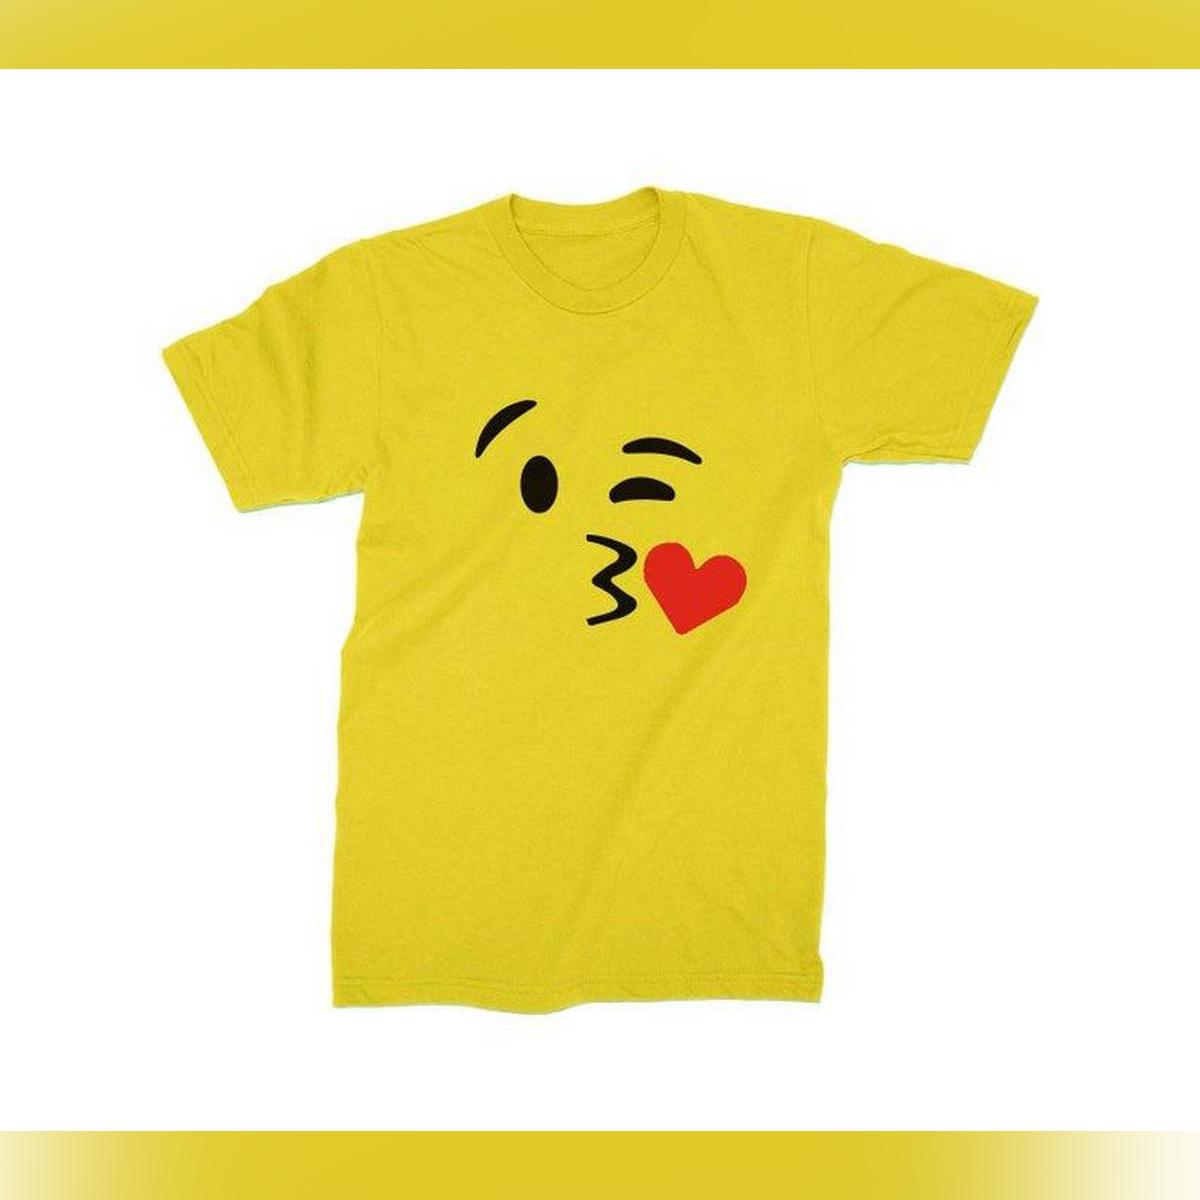 Kiss Emoji T-shirt Smiley Faces heart emojis Halloween costume cosplay Women Kids size Shirts